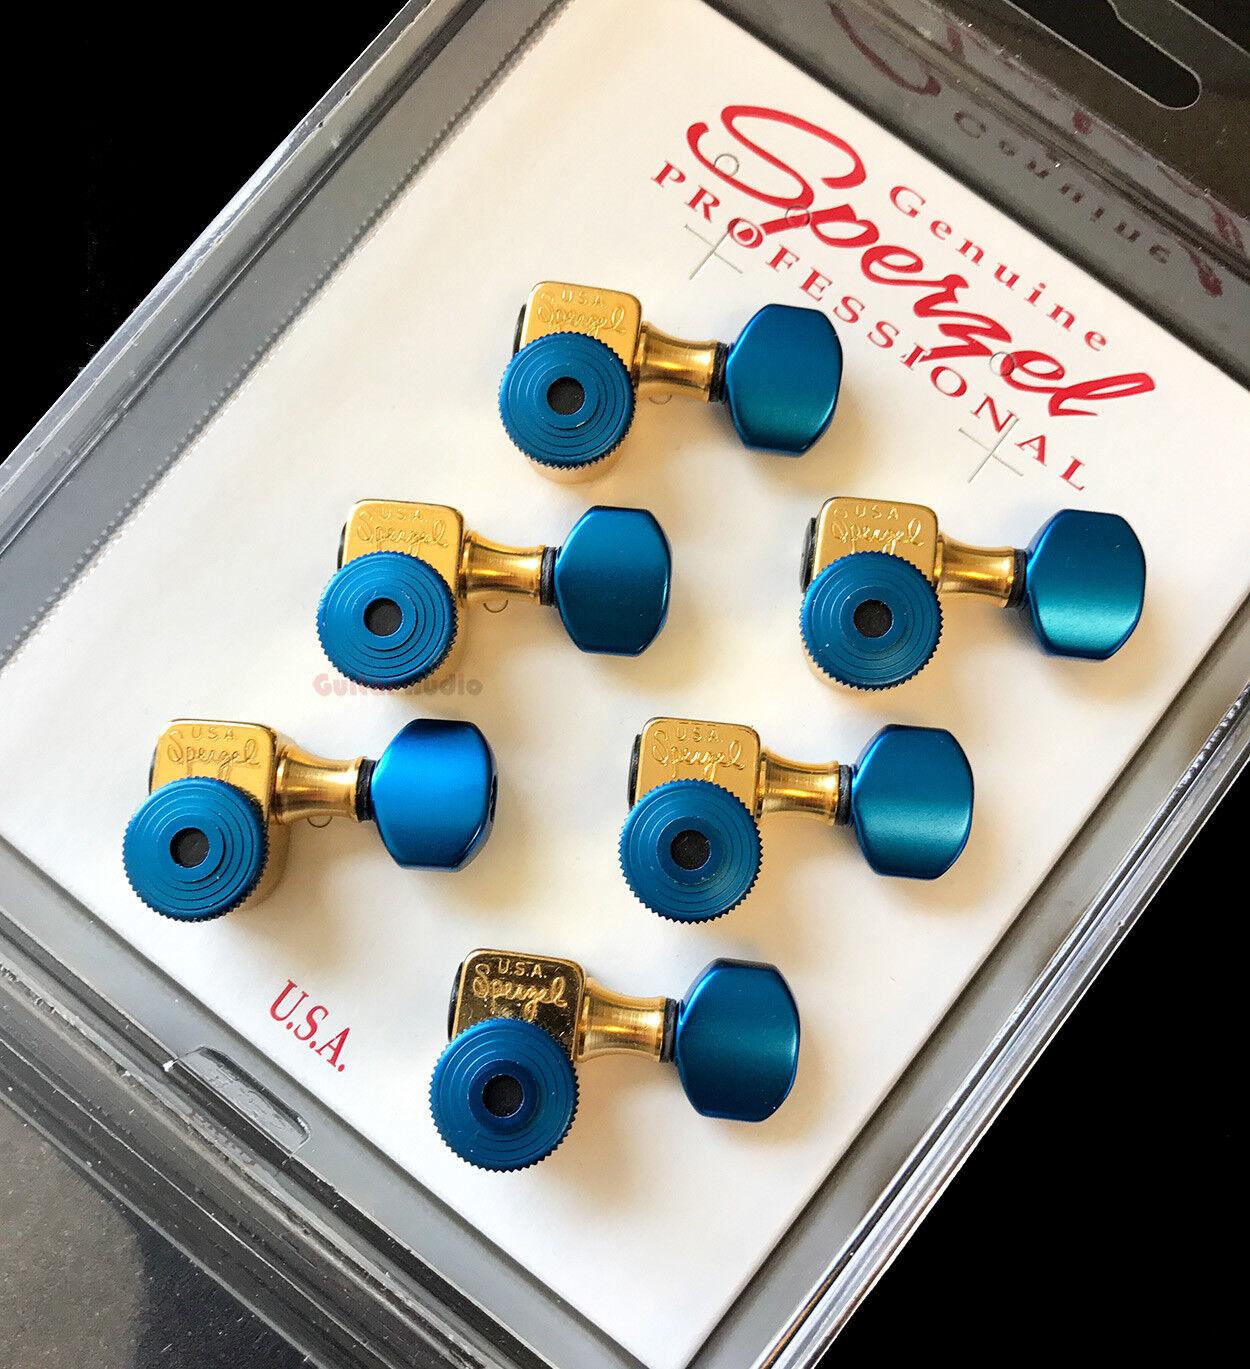 Sperzel 6-In-Line Tri ok Locking Tuners Staggerot Tuning Pegs - Gold & Blau